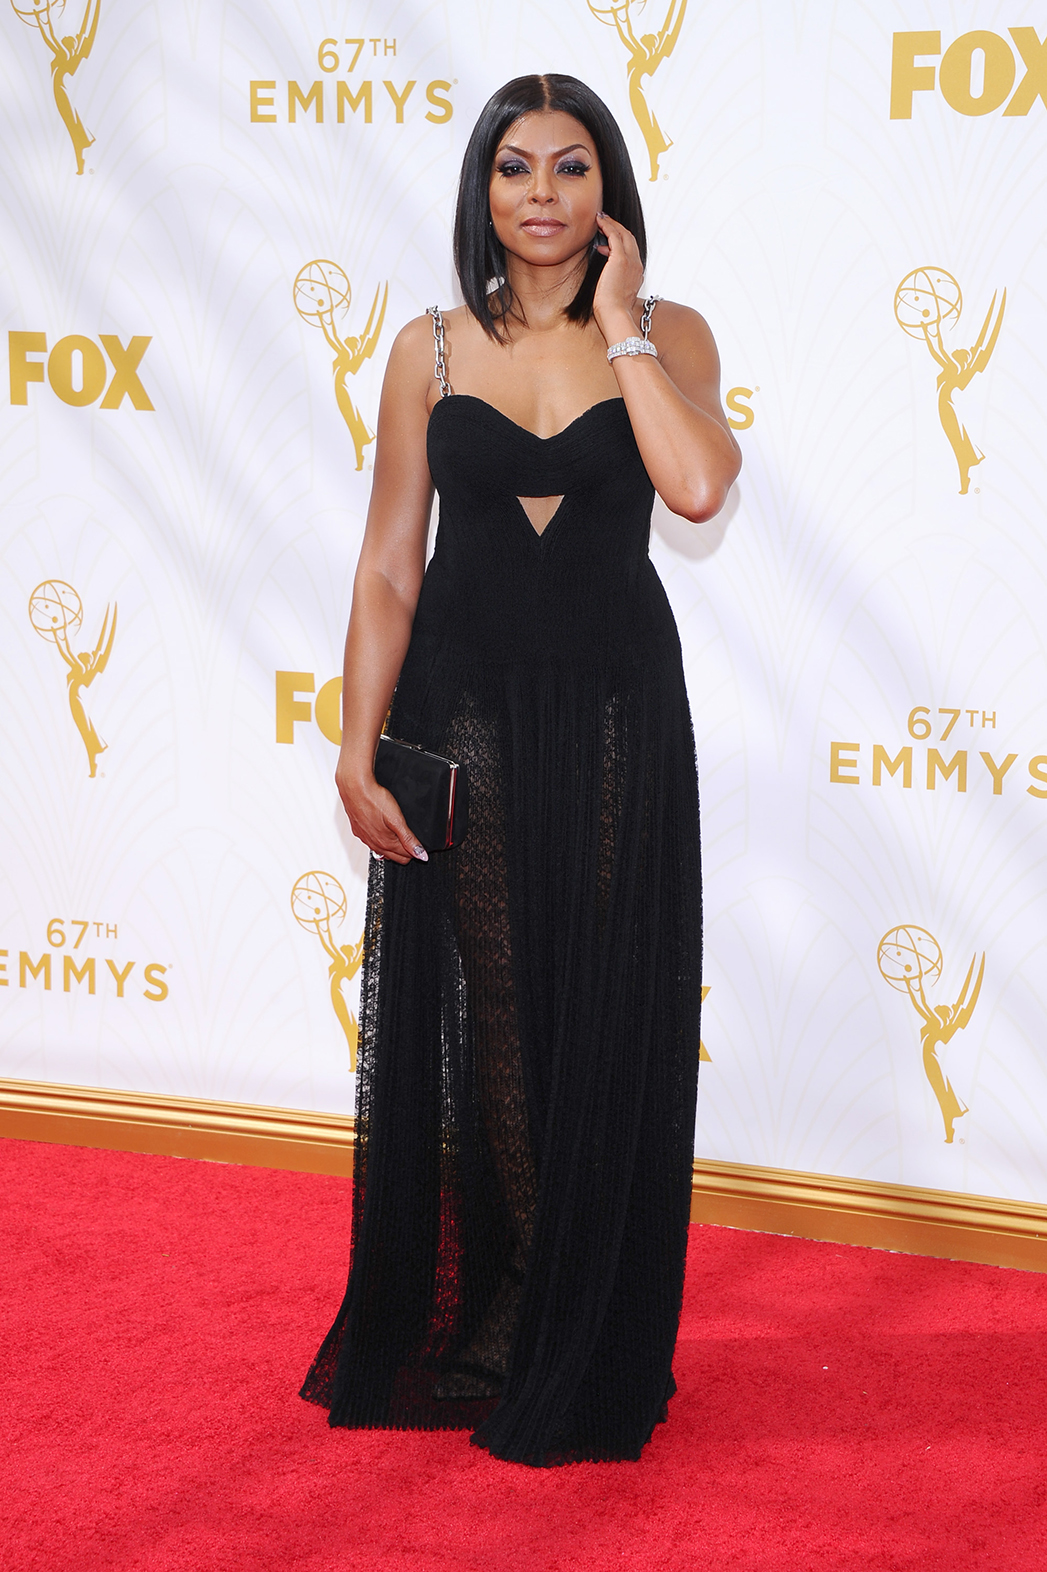 Taraji P. Henson Emmys Arrival - P 2015